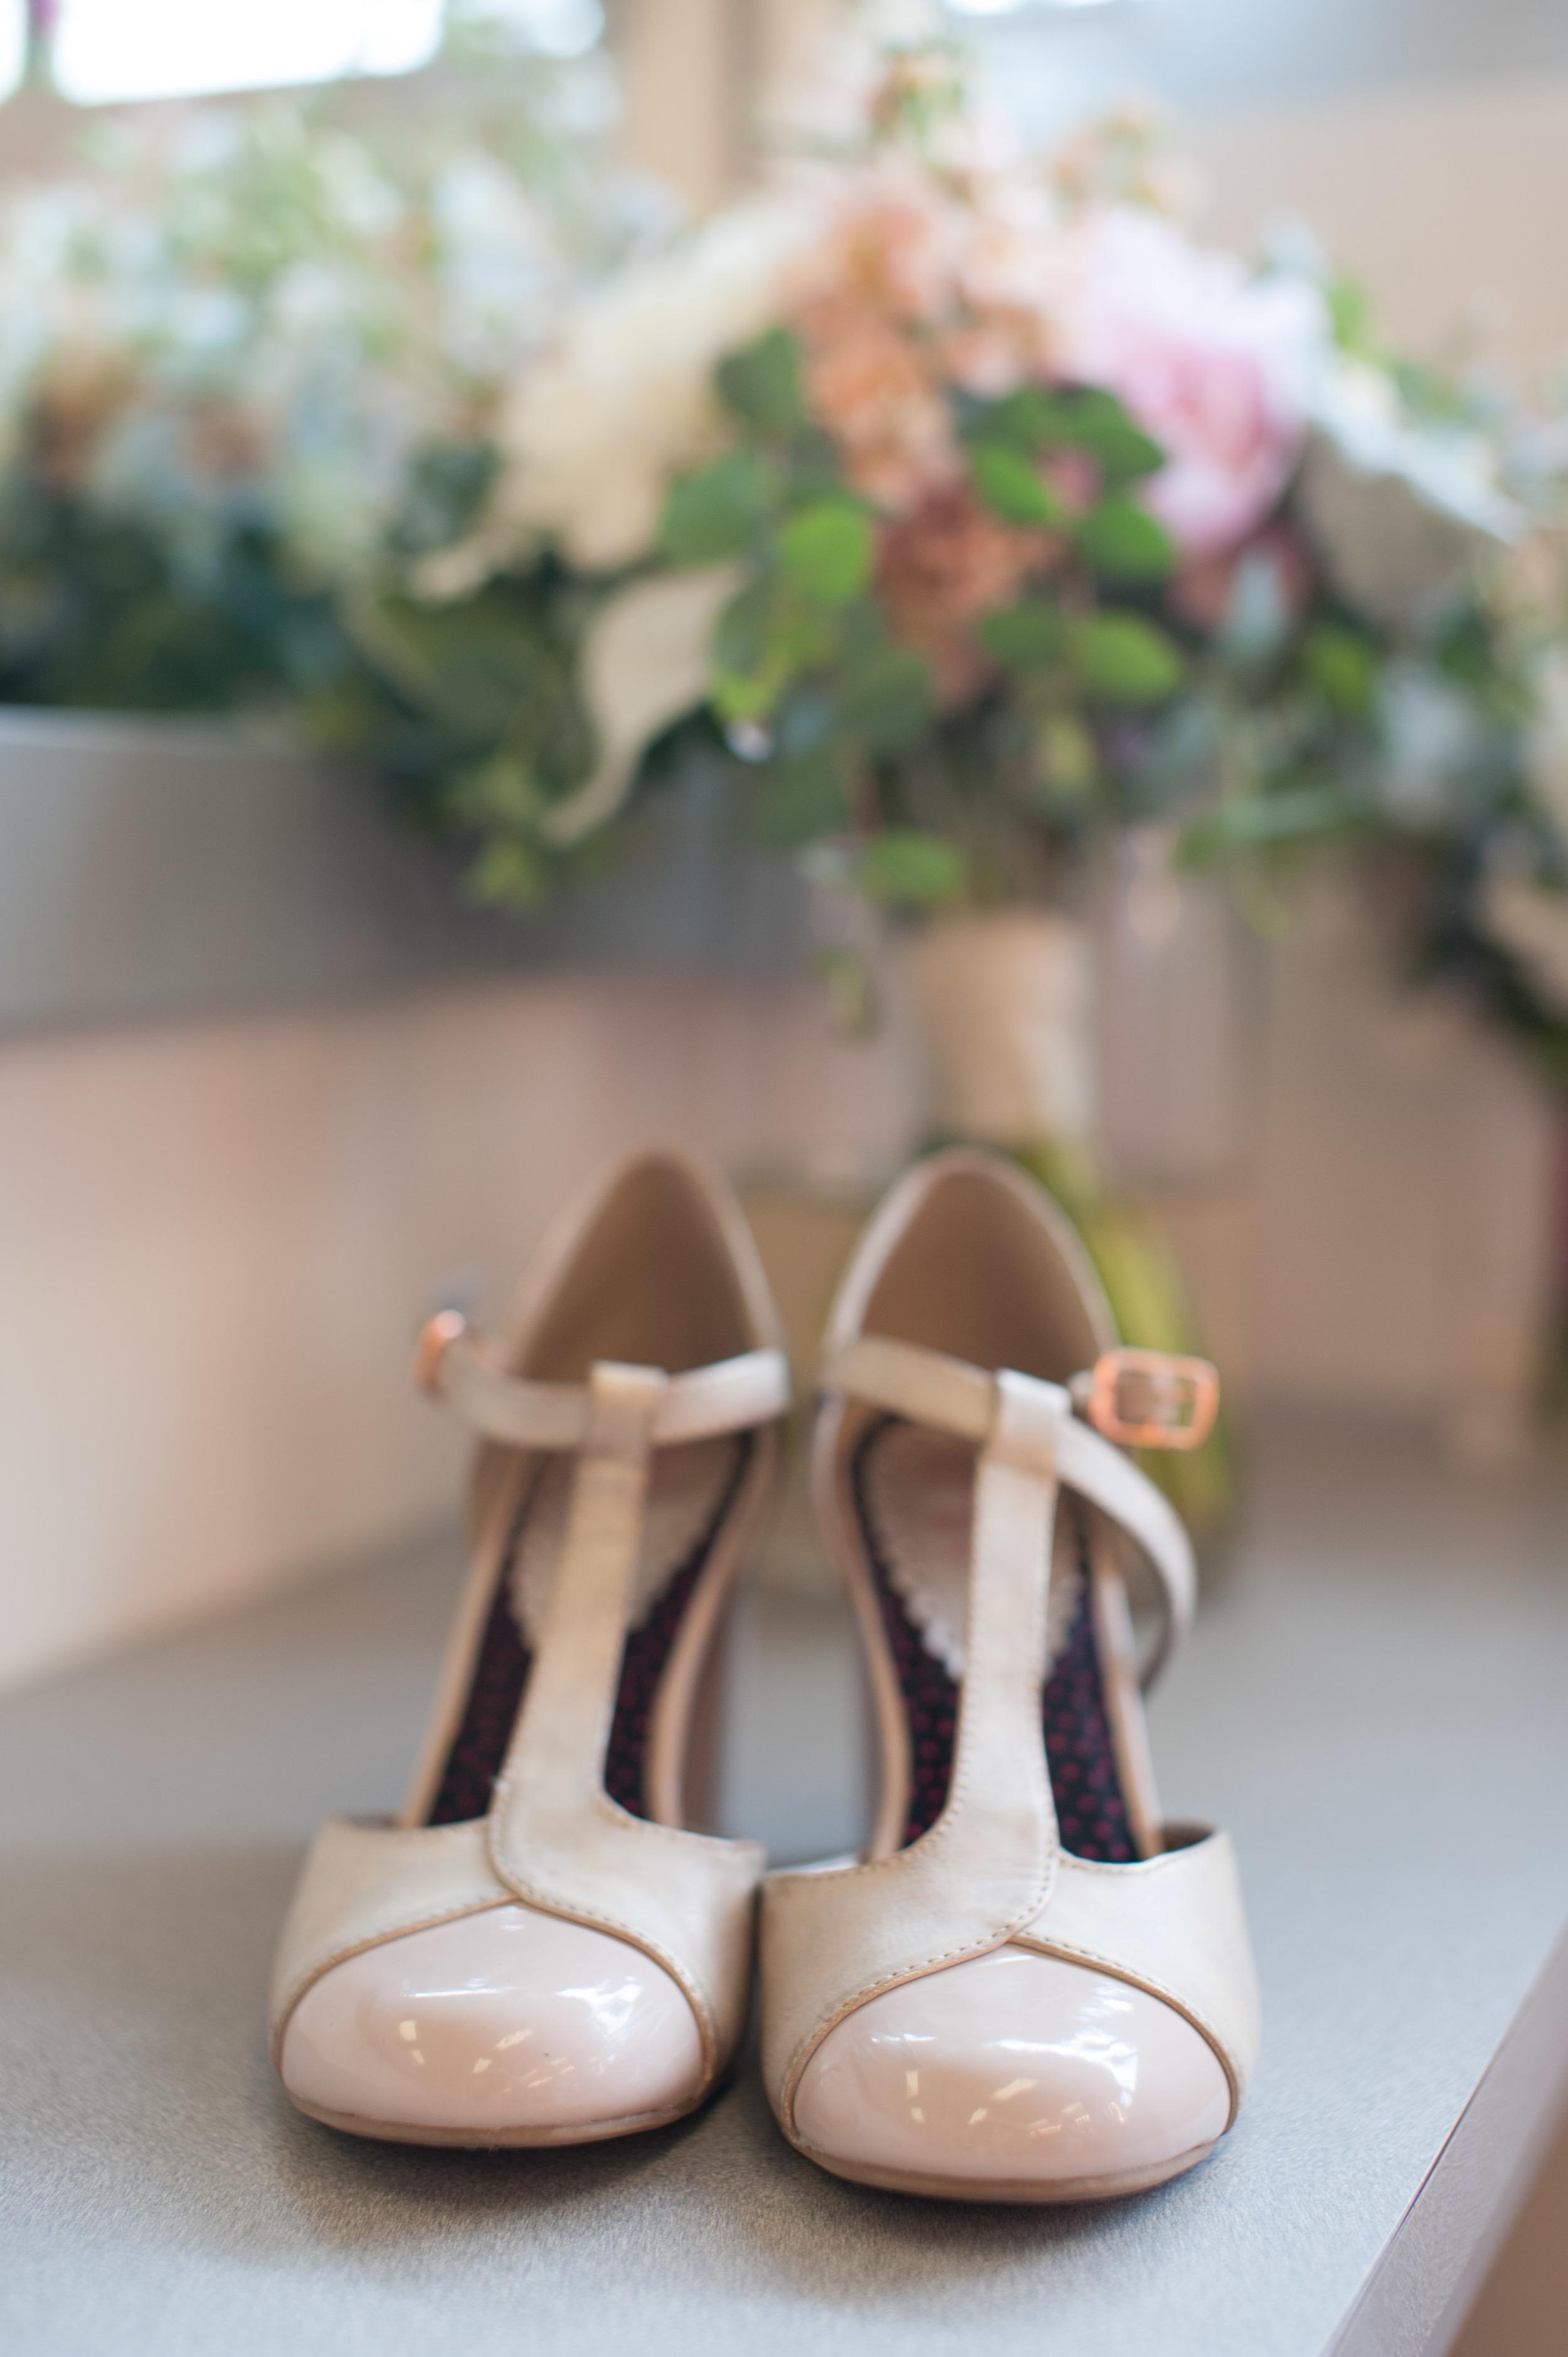 omaha-holland-arts-center-wedding-6.jpg